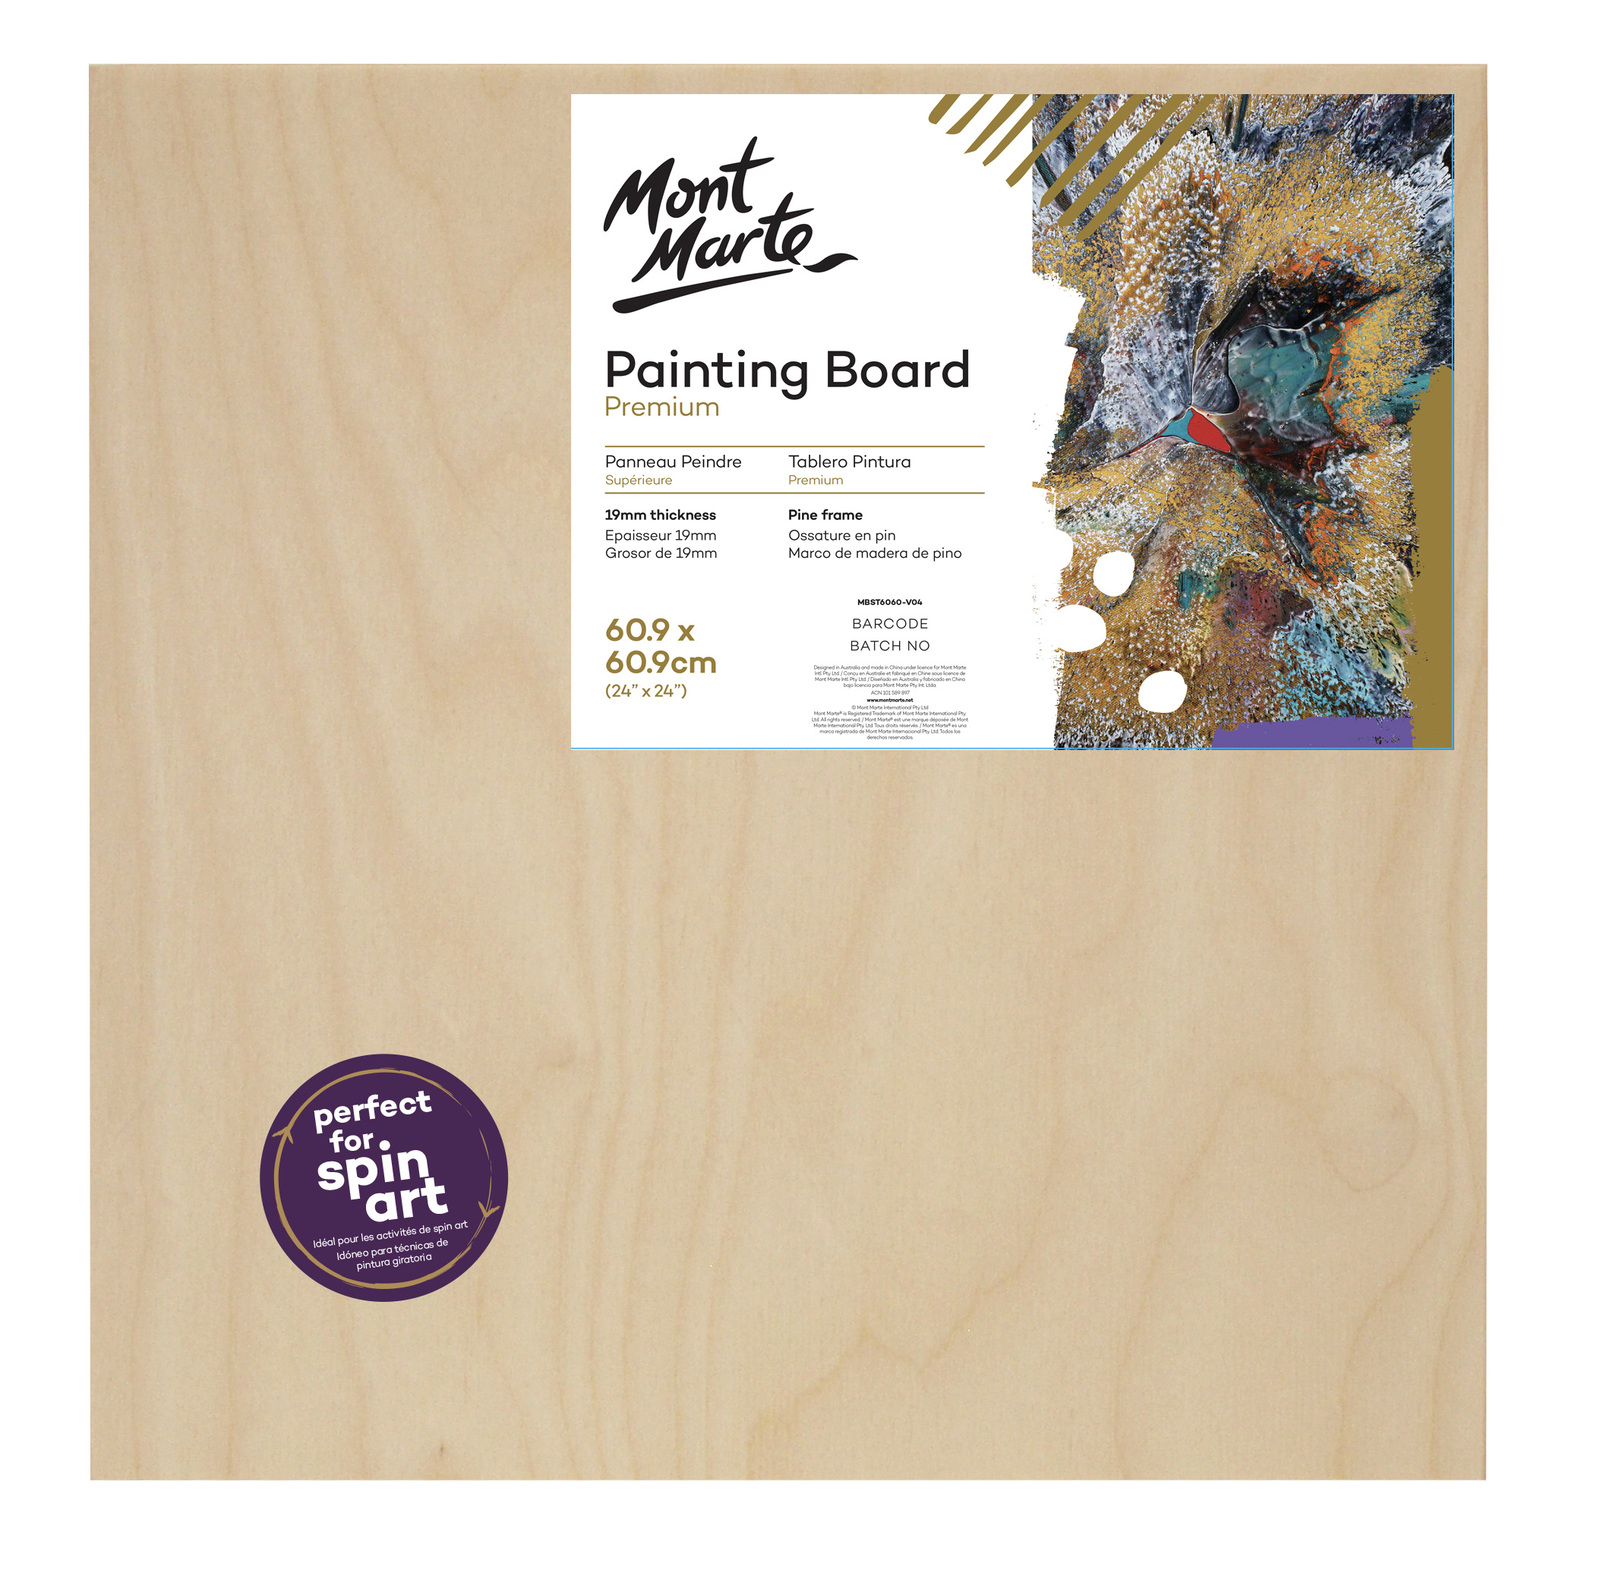 Premium Wood Painting Board 60.9 x 60.9cm